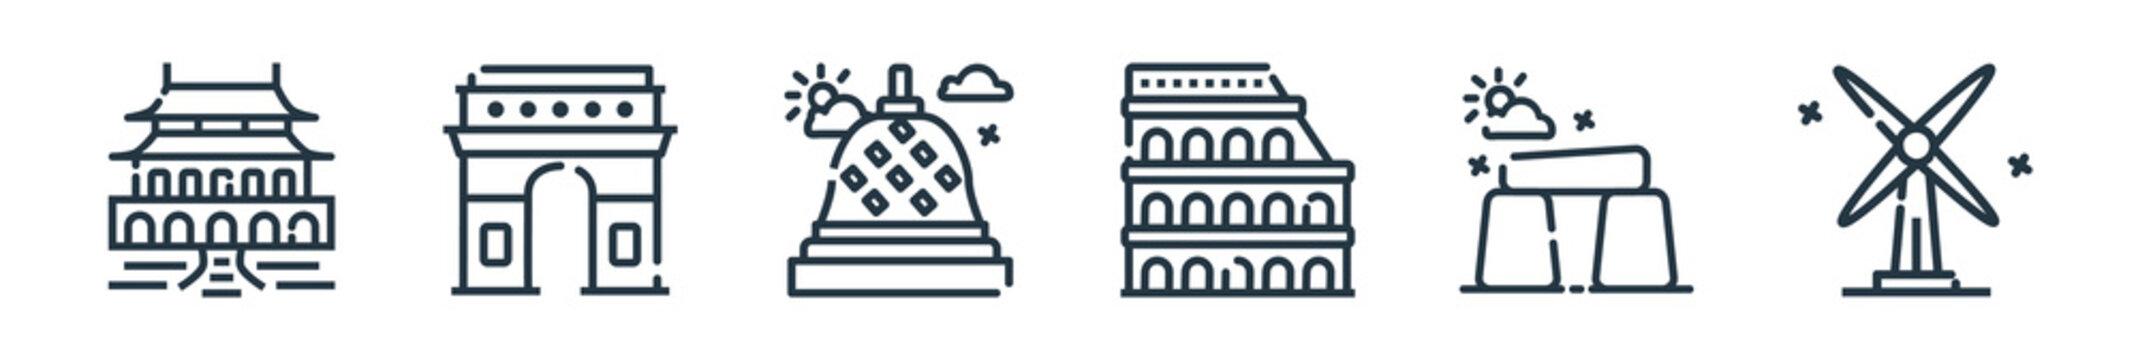 outline set of world monument line icons. linear vector icons such as forbidden city, arc de triomphe, borobudur, colosseum, stonehenge, kinderdijk. vector illustration.